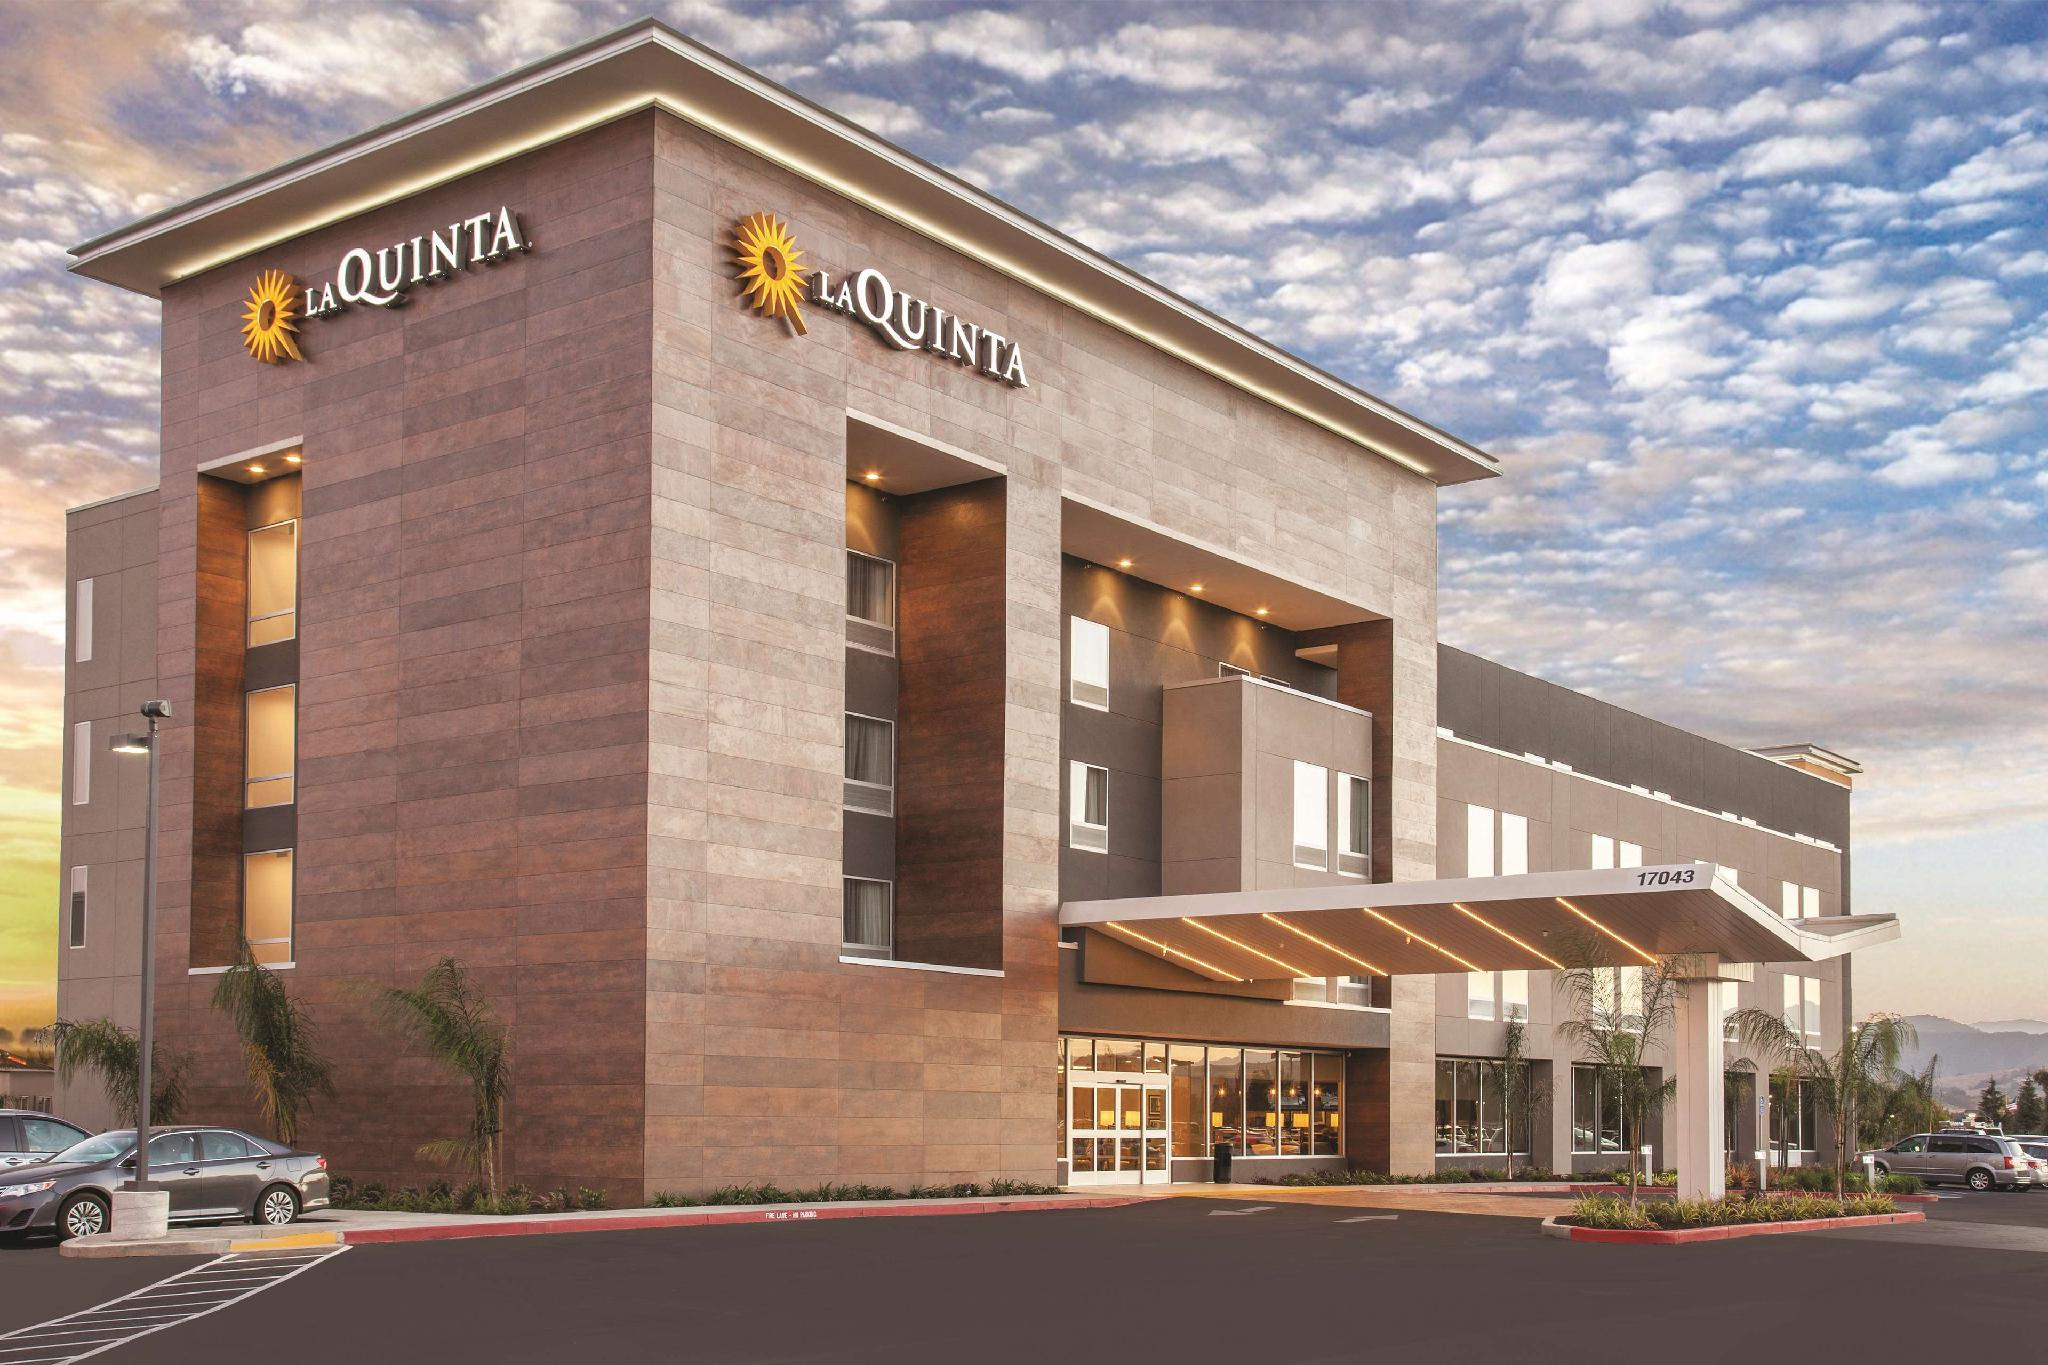 La Quinta Inn And Suites By Wyndham Morgan Hill San Jose South